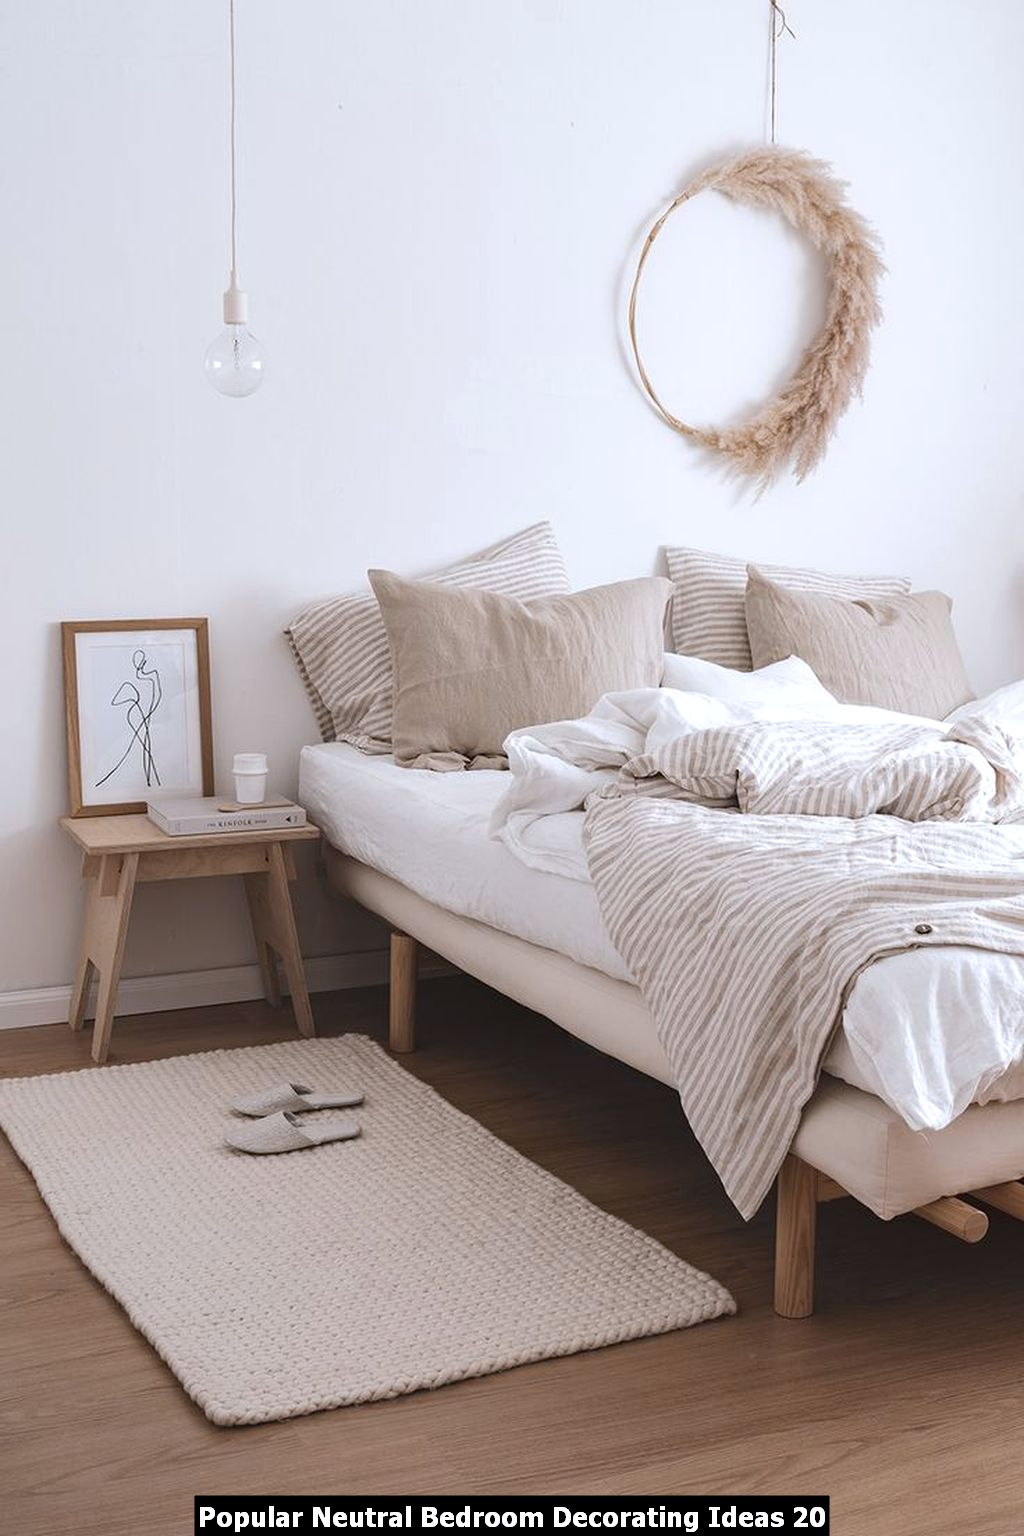 Popular Neutral Bedroom Decorating Ideas 20